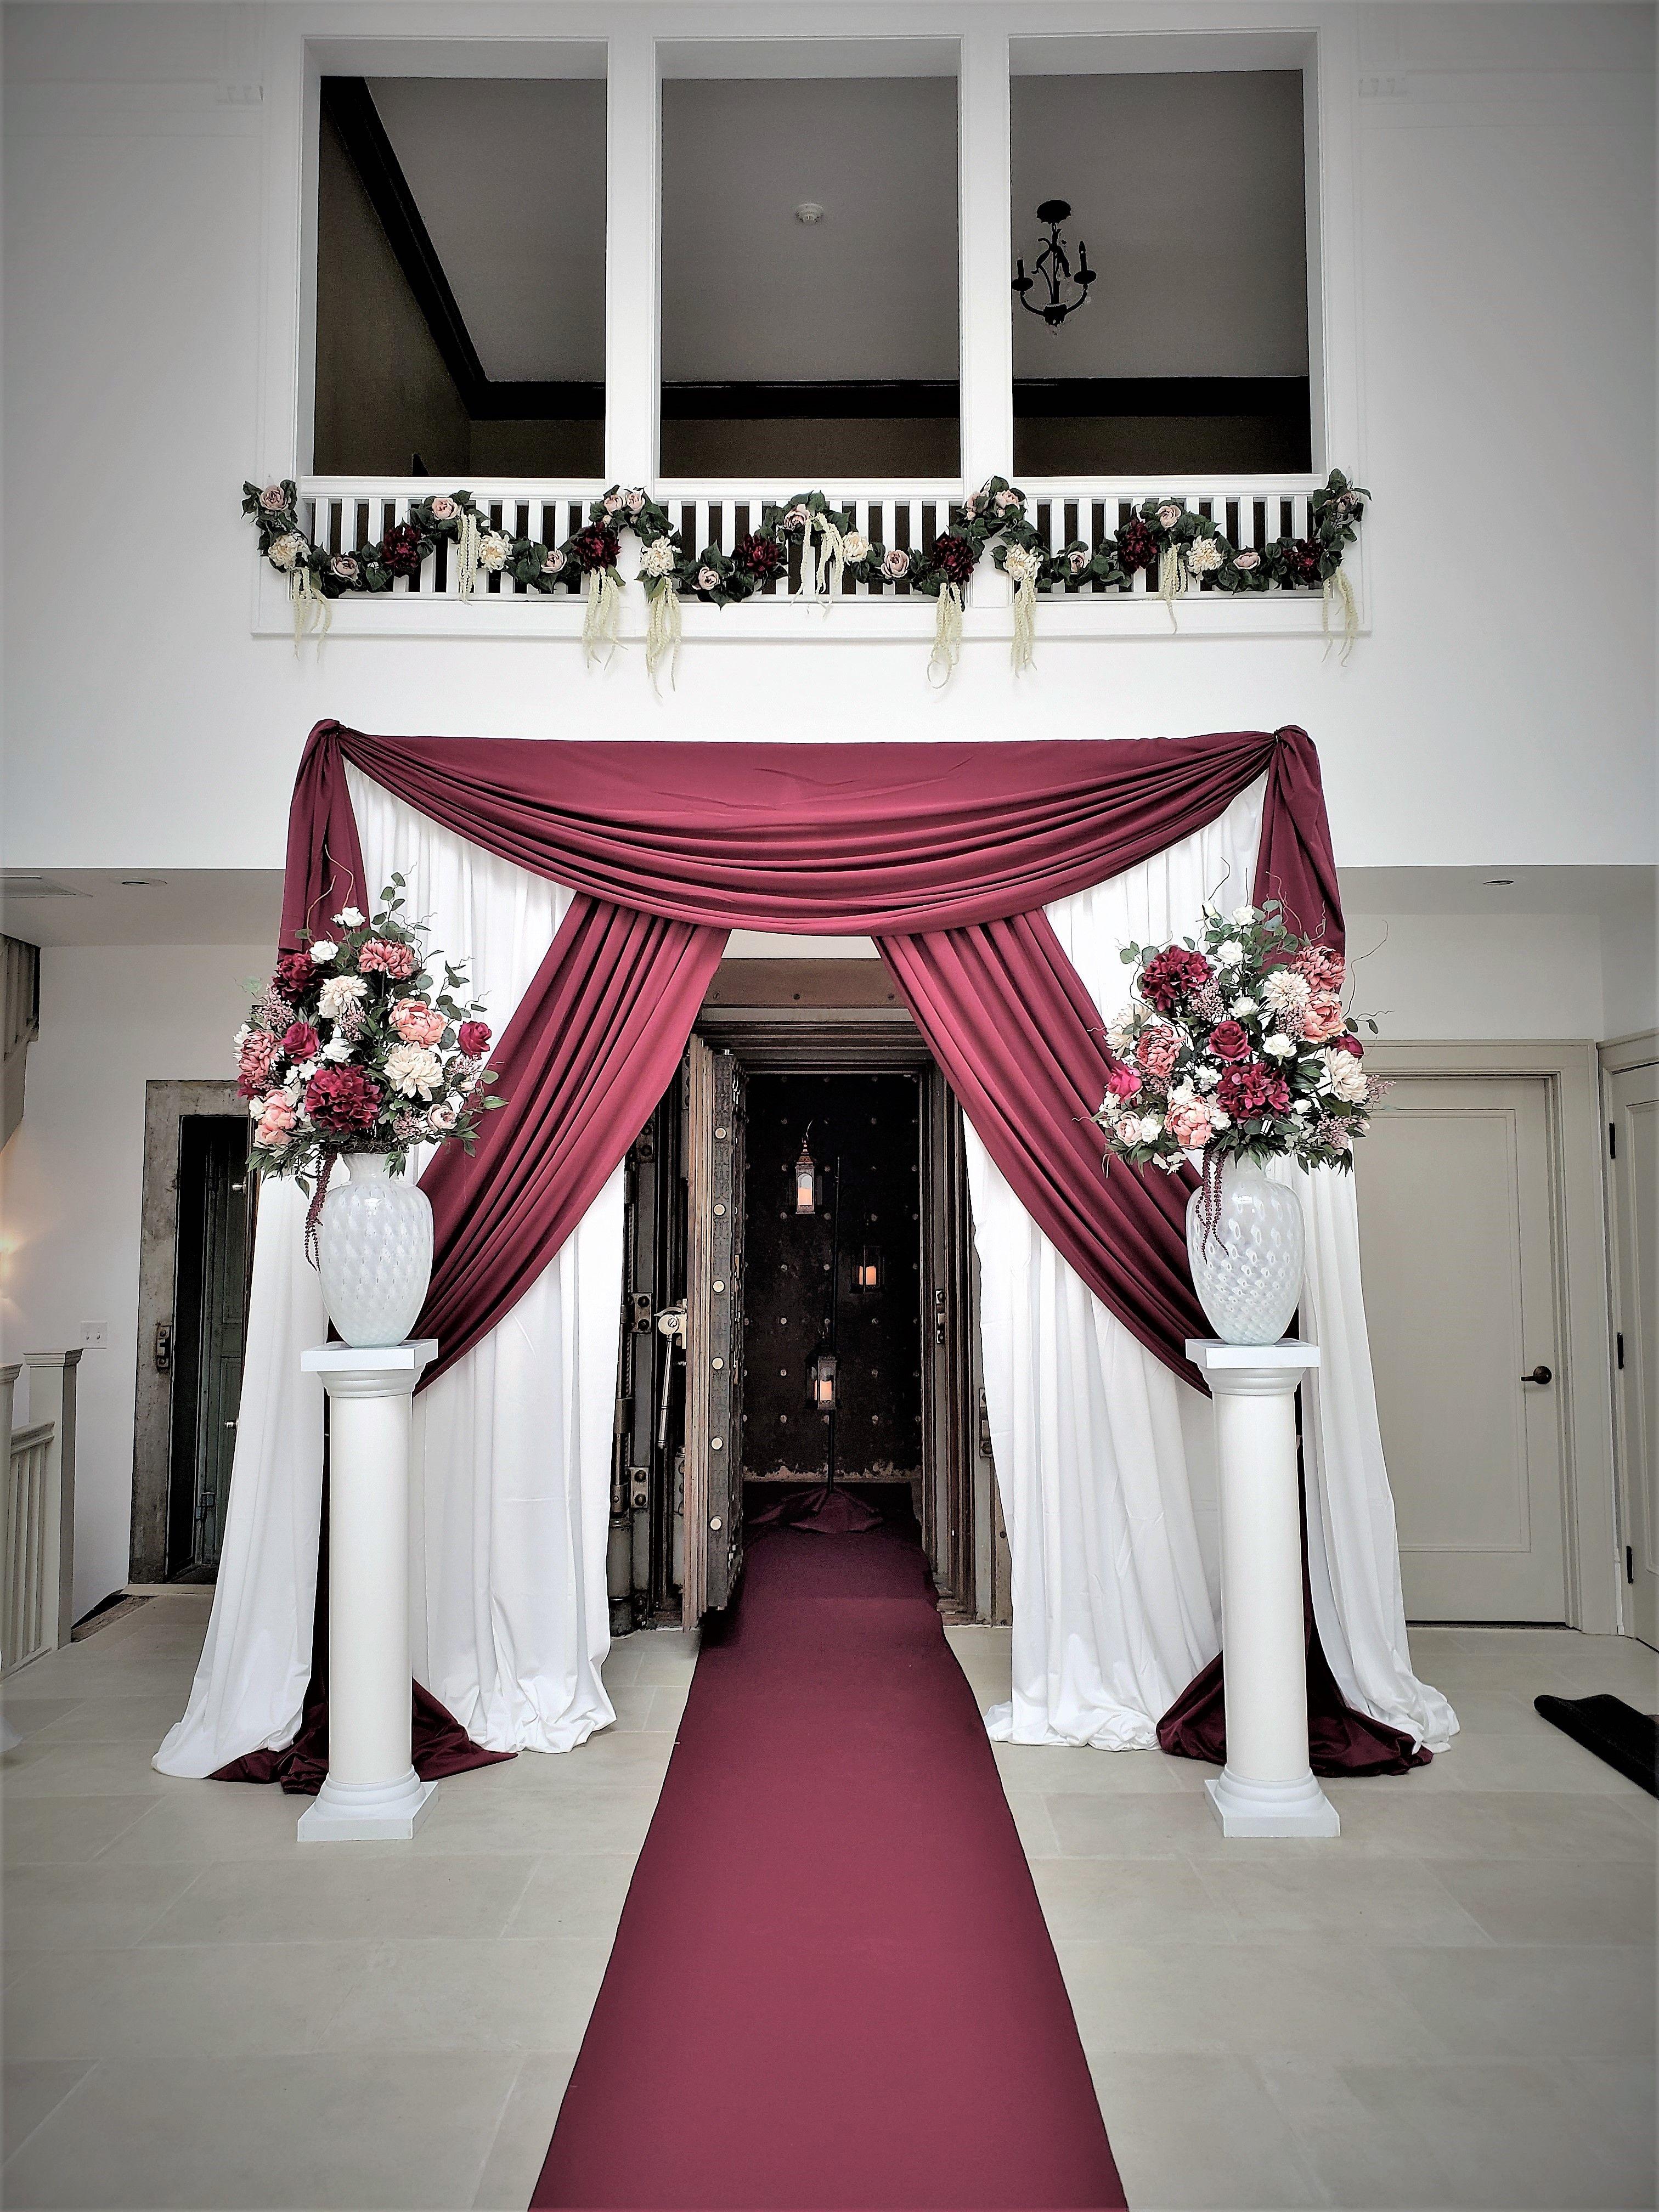 Burgundy And White Ceremony Backdrop Burgundy Wedding Burgundy Wedding Dress Pink And Burgundy Wedding